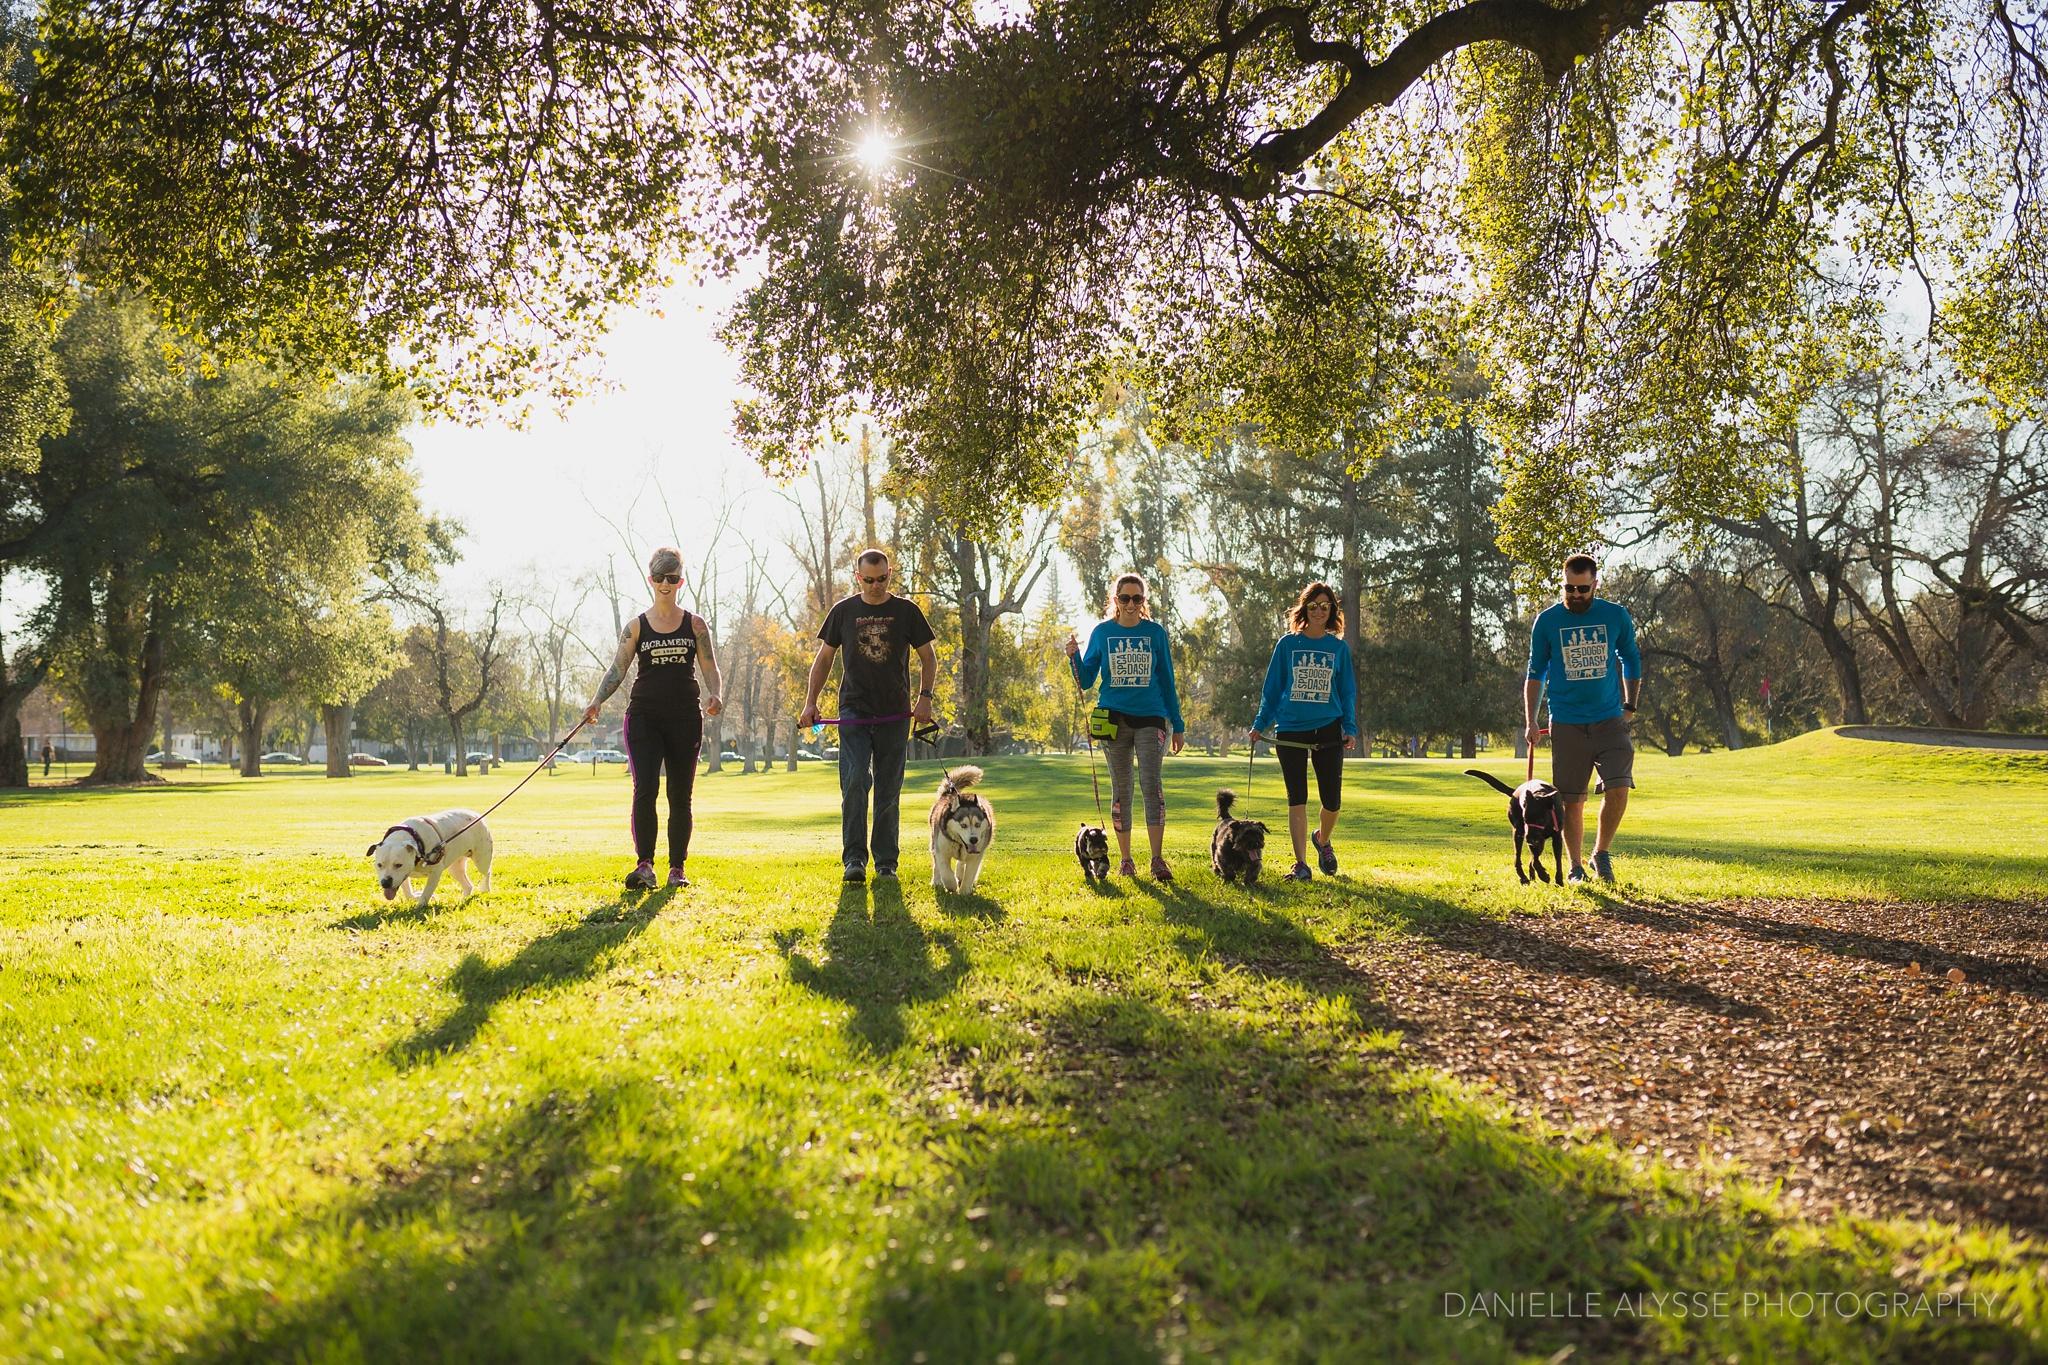 180205_sspca_spca_willam_land_park_doggy_dash_california_danielle_alysse_photography_sacramento_pet_dog_photographer_3_WEB.jpg